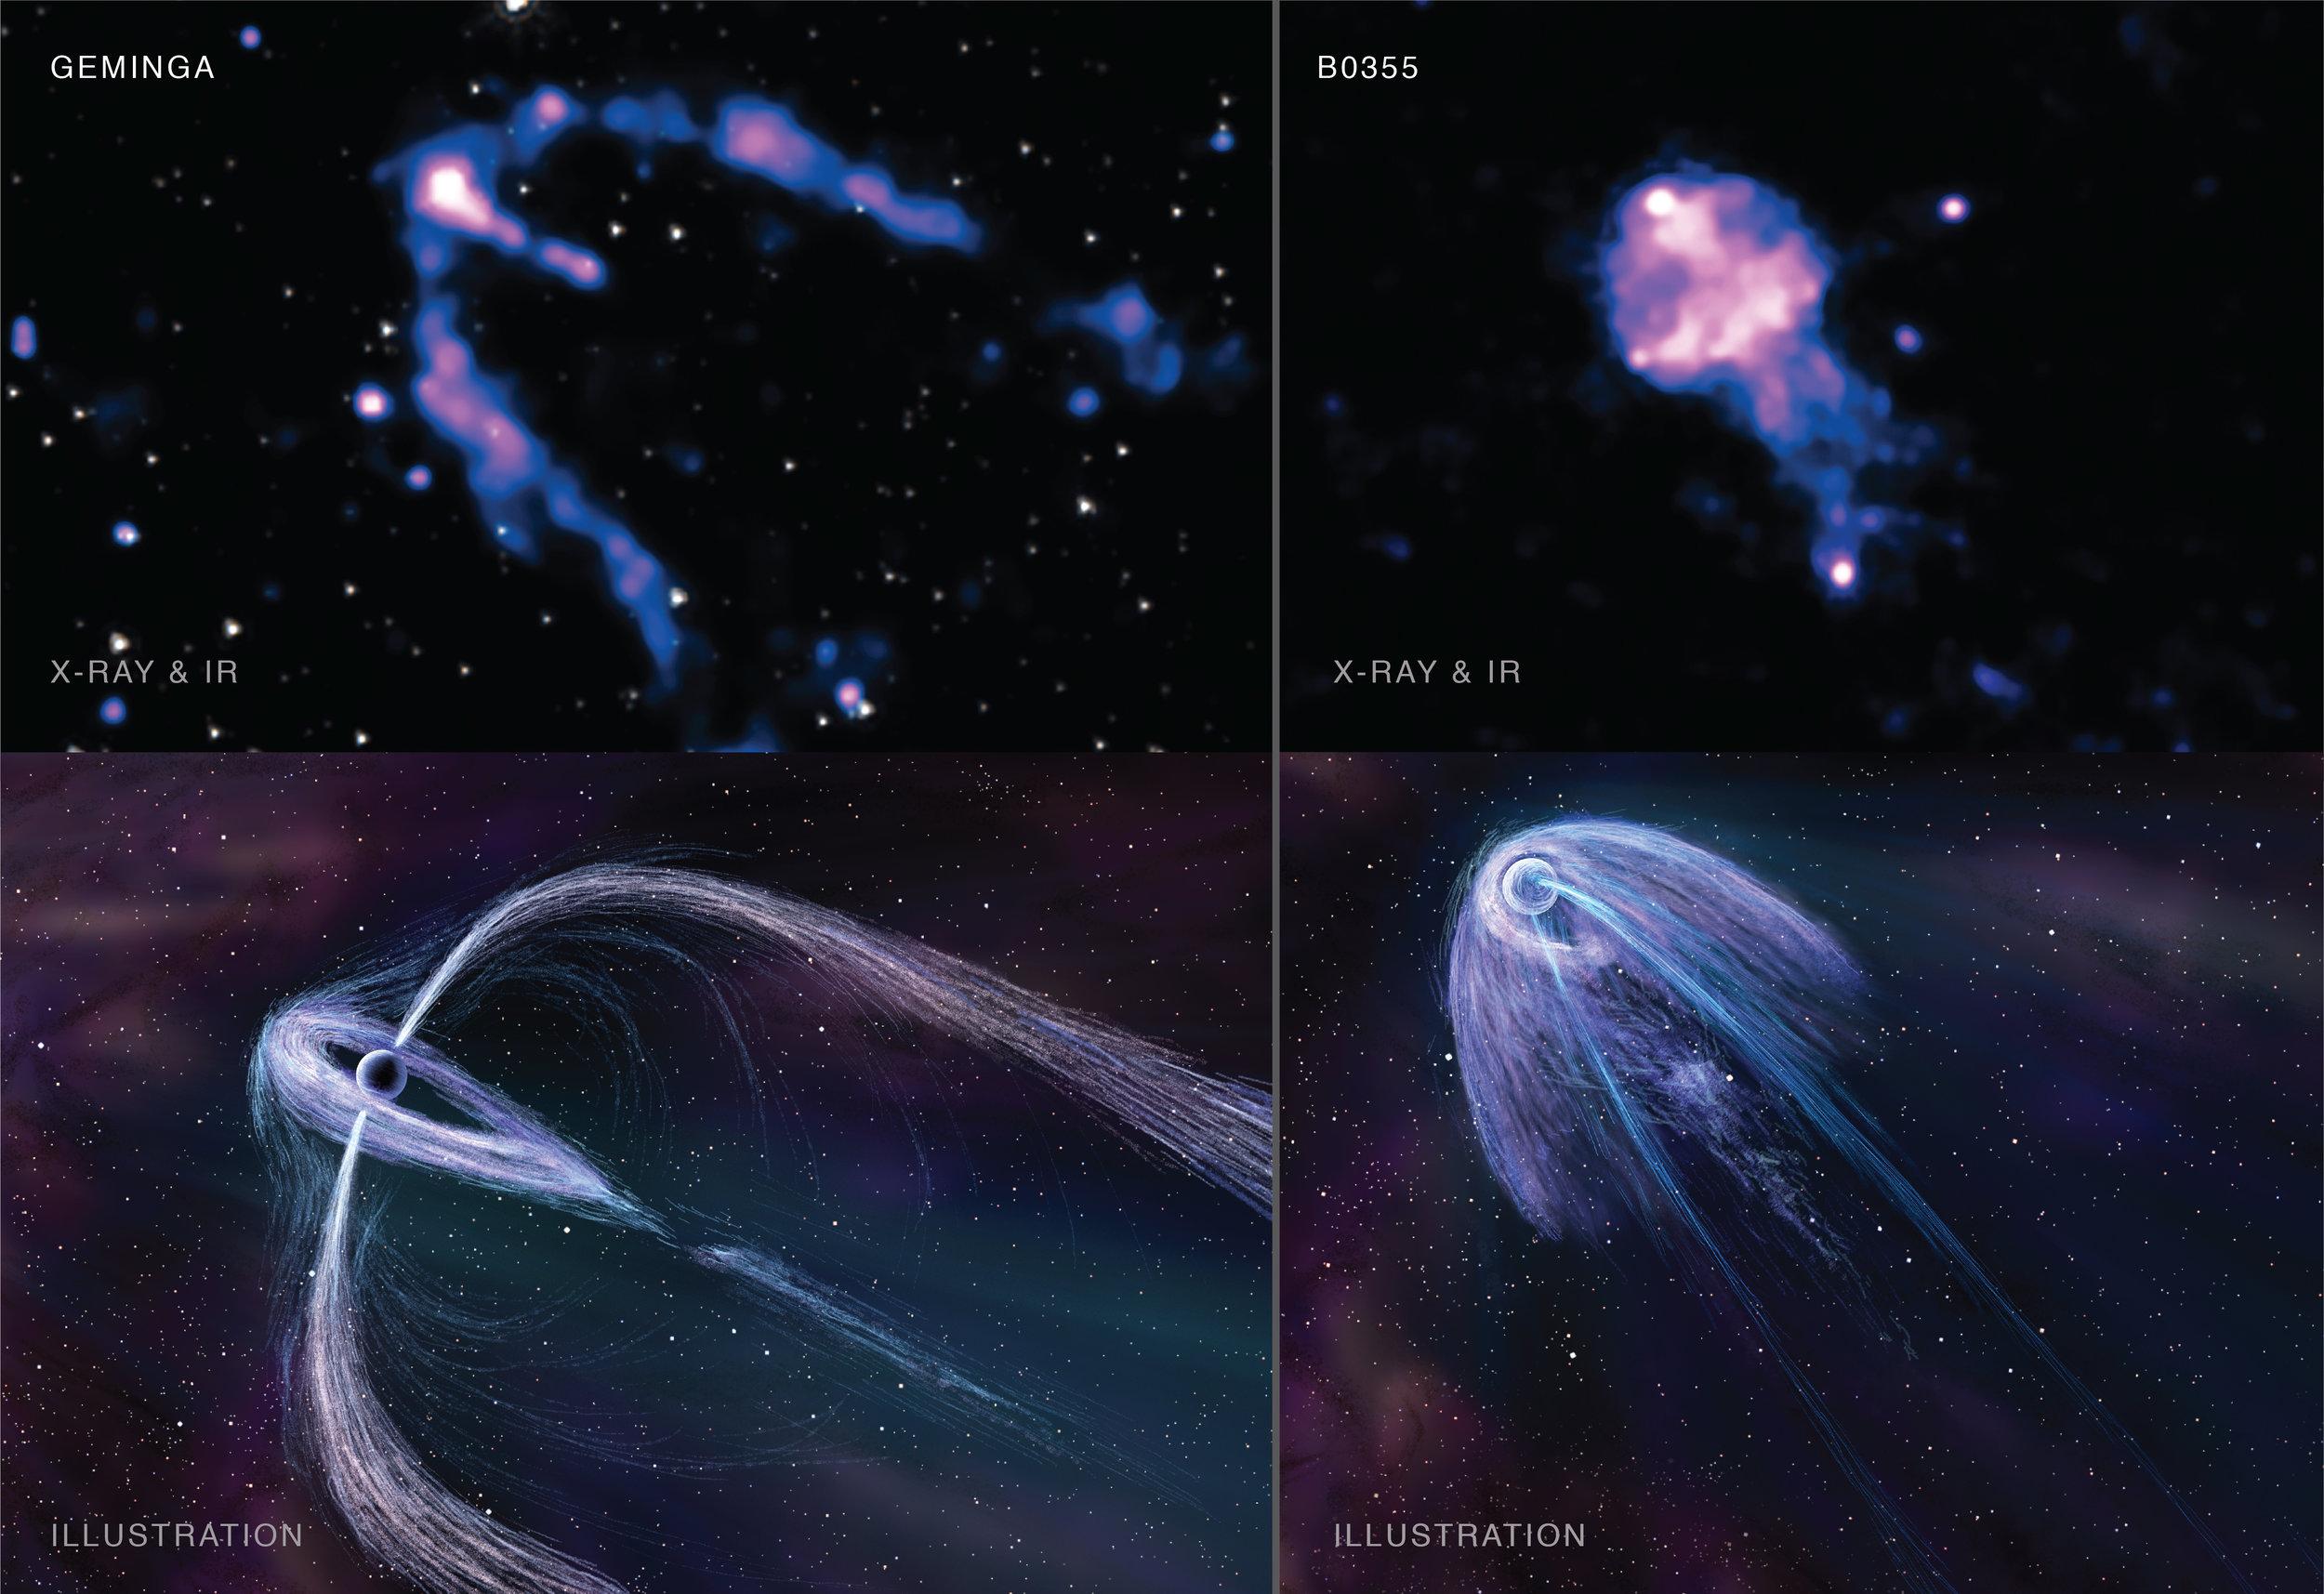 Image credit: Geminga image: NASA/CXC/PSU/B. Posselt et al; Infrared: NASA/JPL-Caltech; B0355+54: X-ray: NASA/CXC/GWU/N. Klingler et al; Infrared: NASA/JPL-Caltech; Illustrations: Nahks TrEhnl